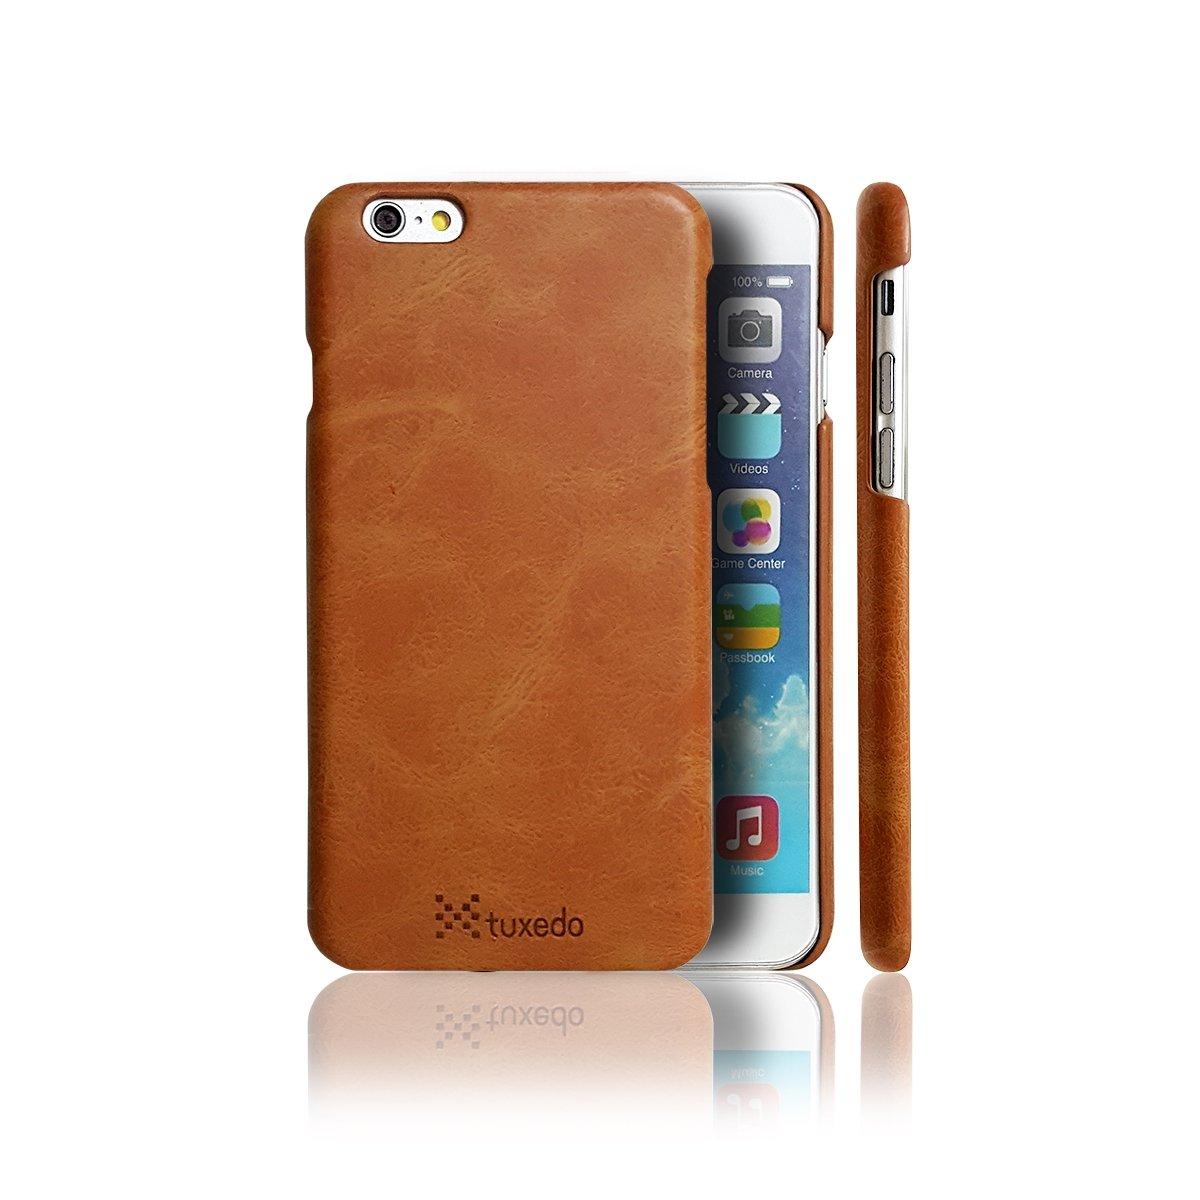 Ốp lưng da iPhone 6/6S Plus Tuxedo, da PU cao cấp, cứng cáp, chống va đập, biến dạng